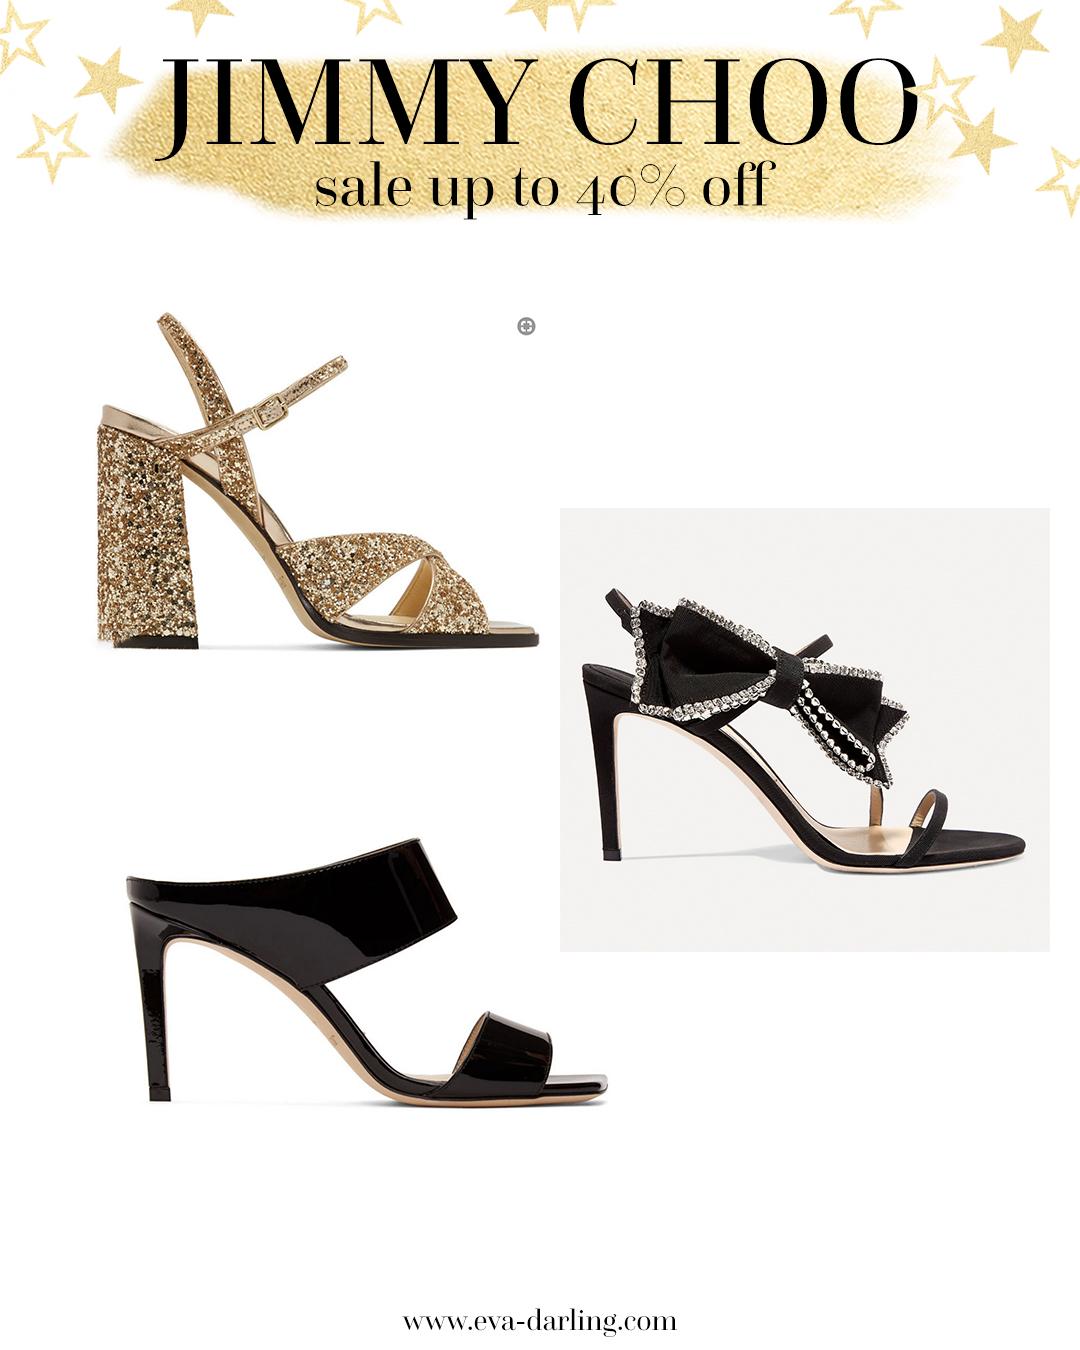 jimmy choo shoe sale, net-a-porter, ssense, luxury designer shoes discount